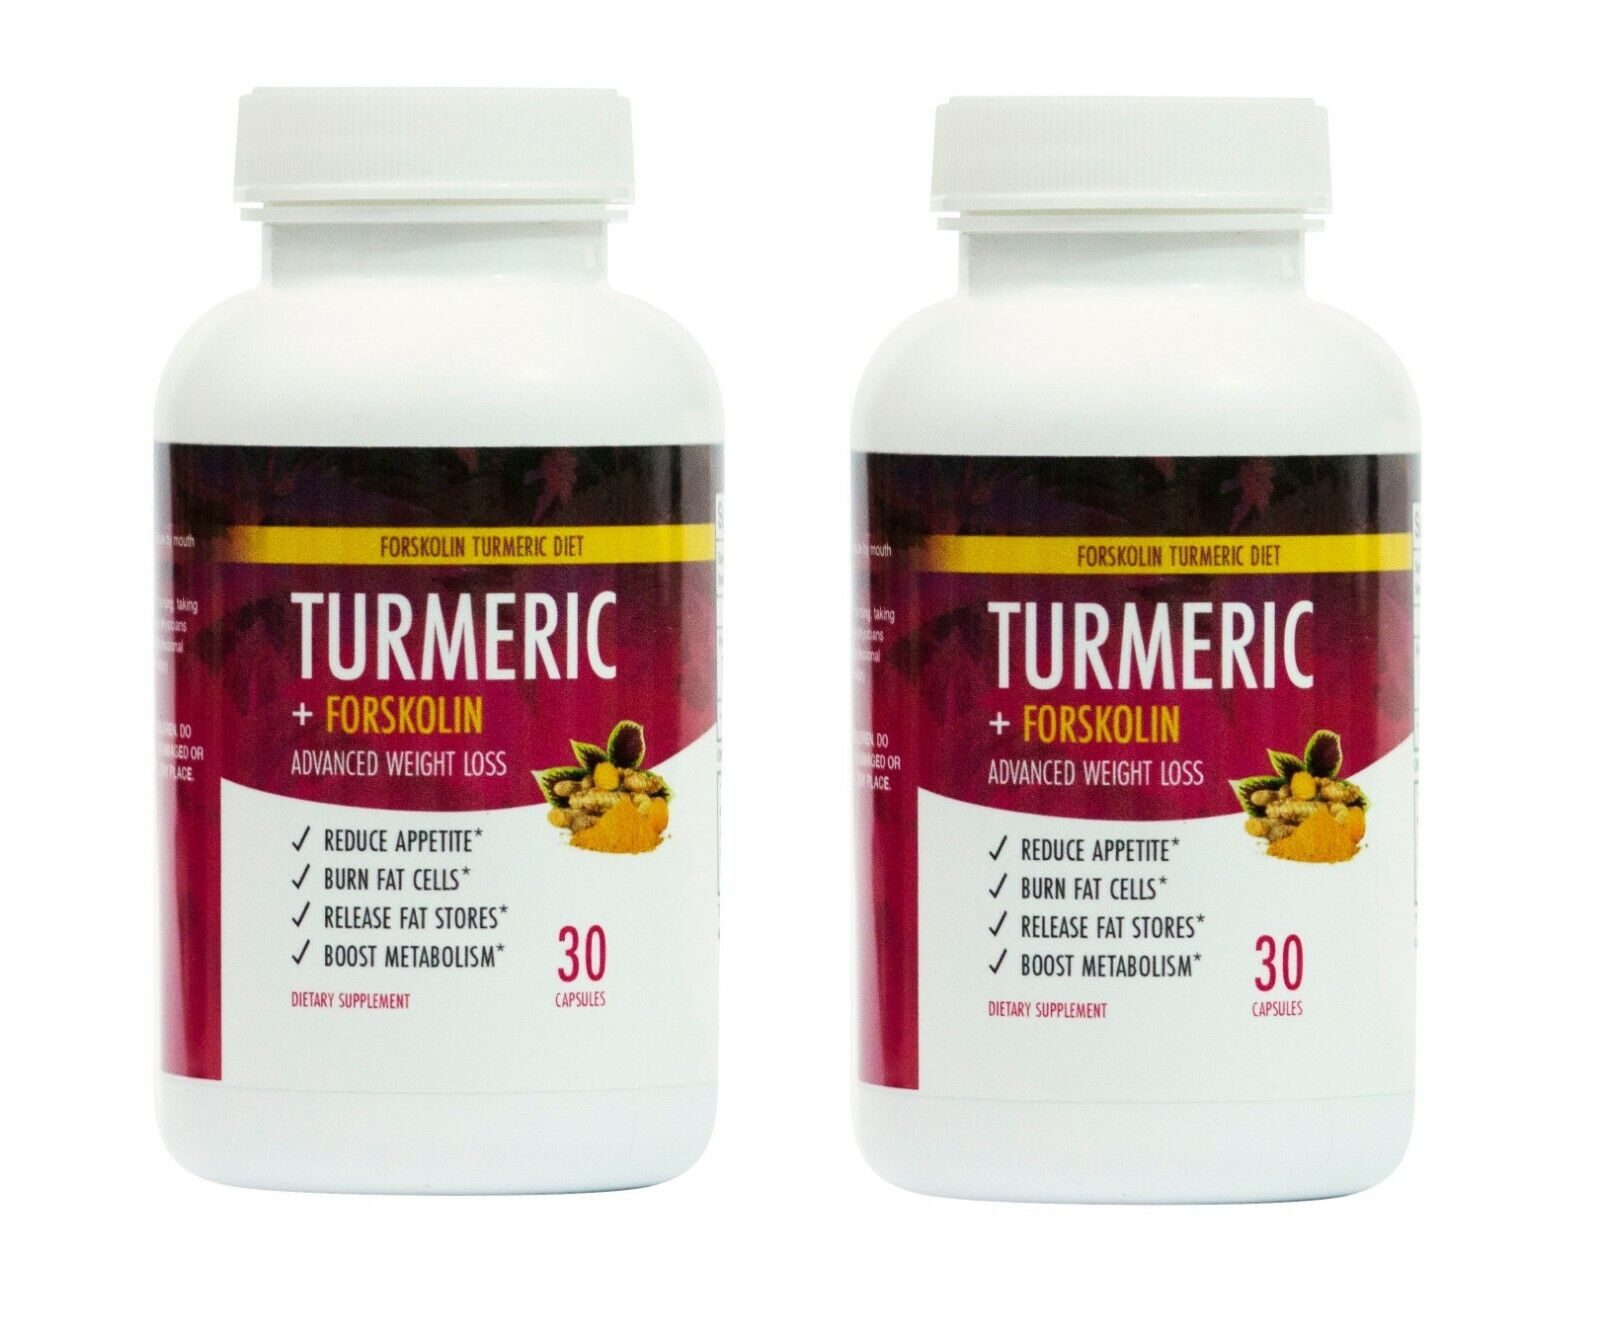 2 Bottles Turmeric and Forskolin Diet Advanced Weight Loss Formula Fat Burn